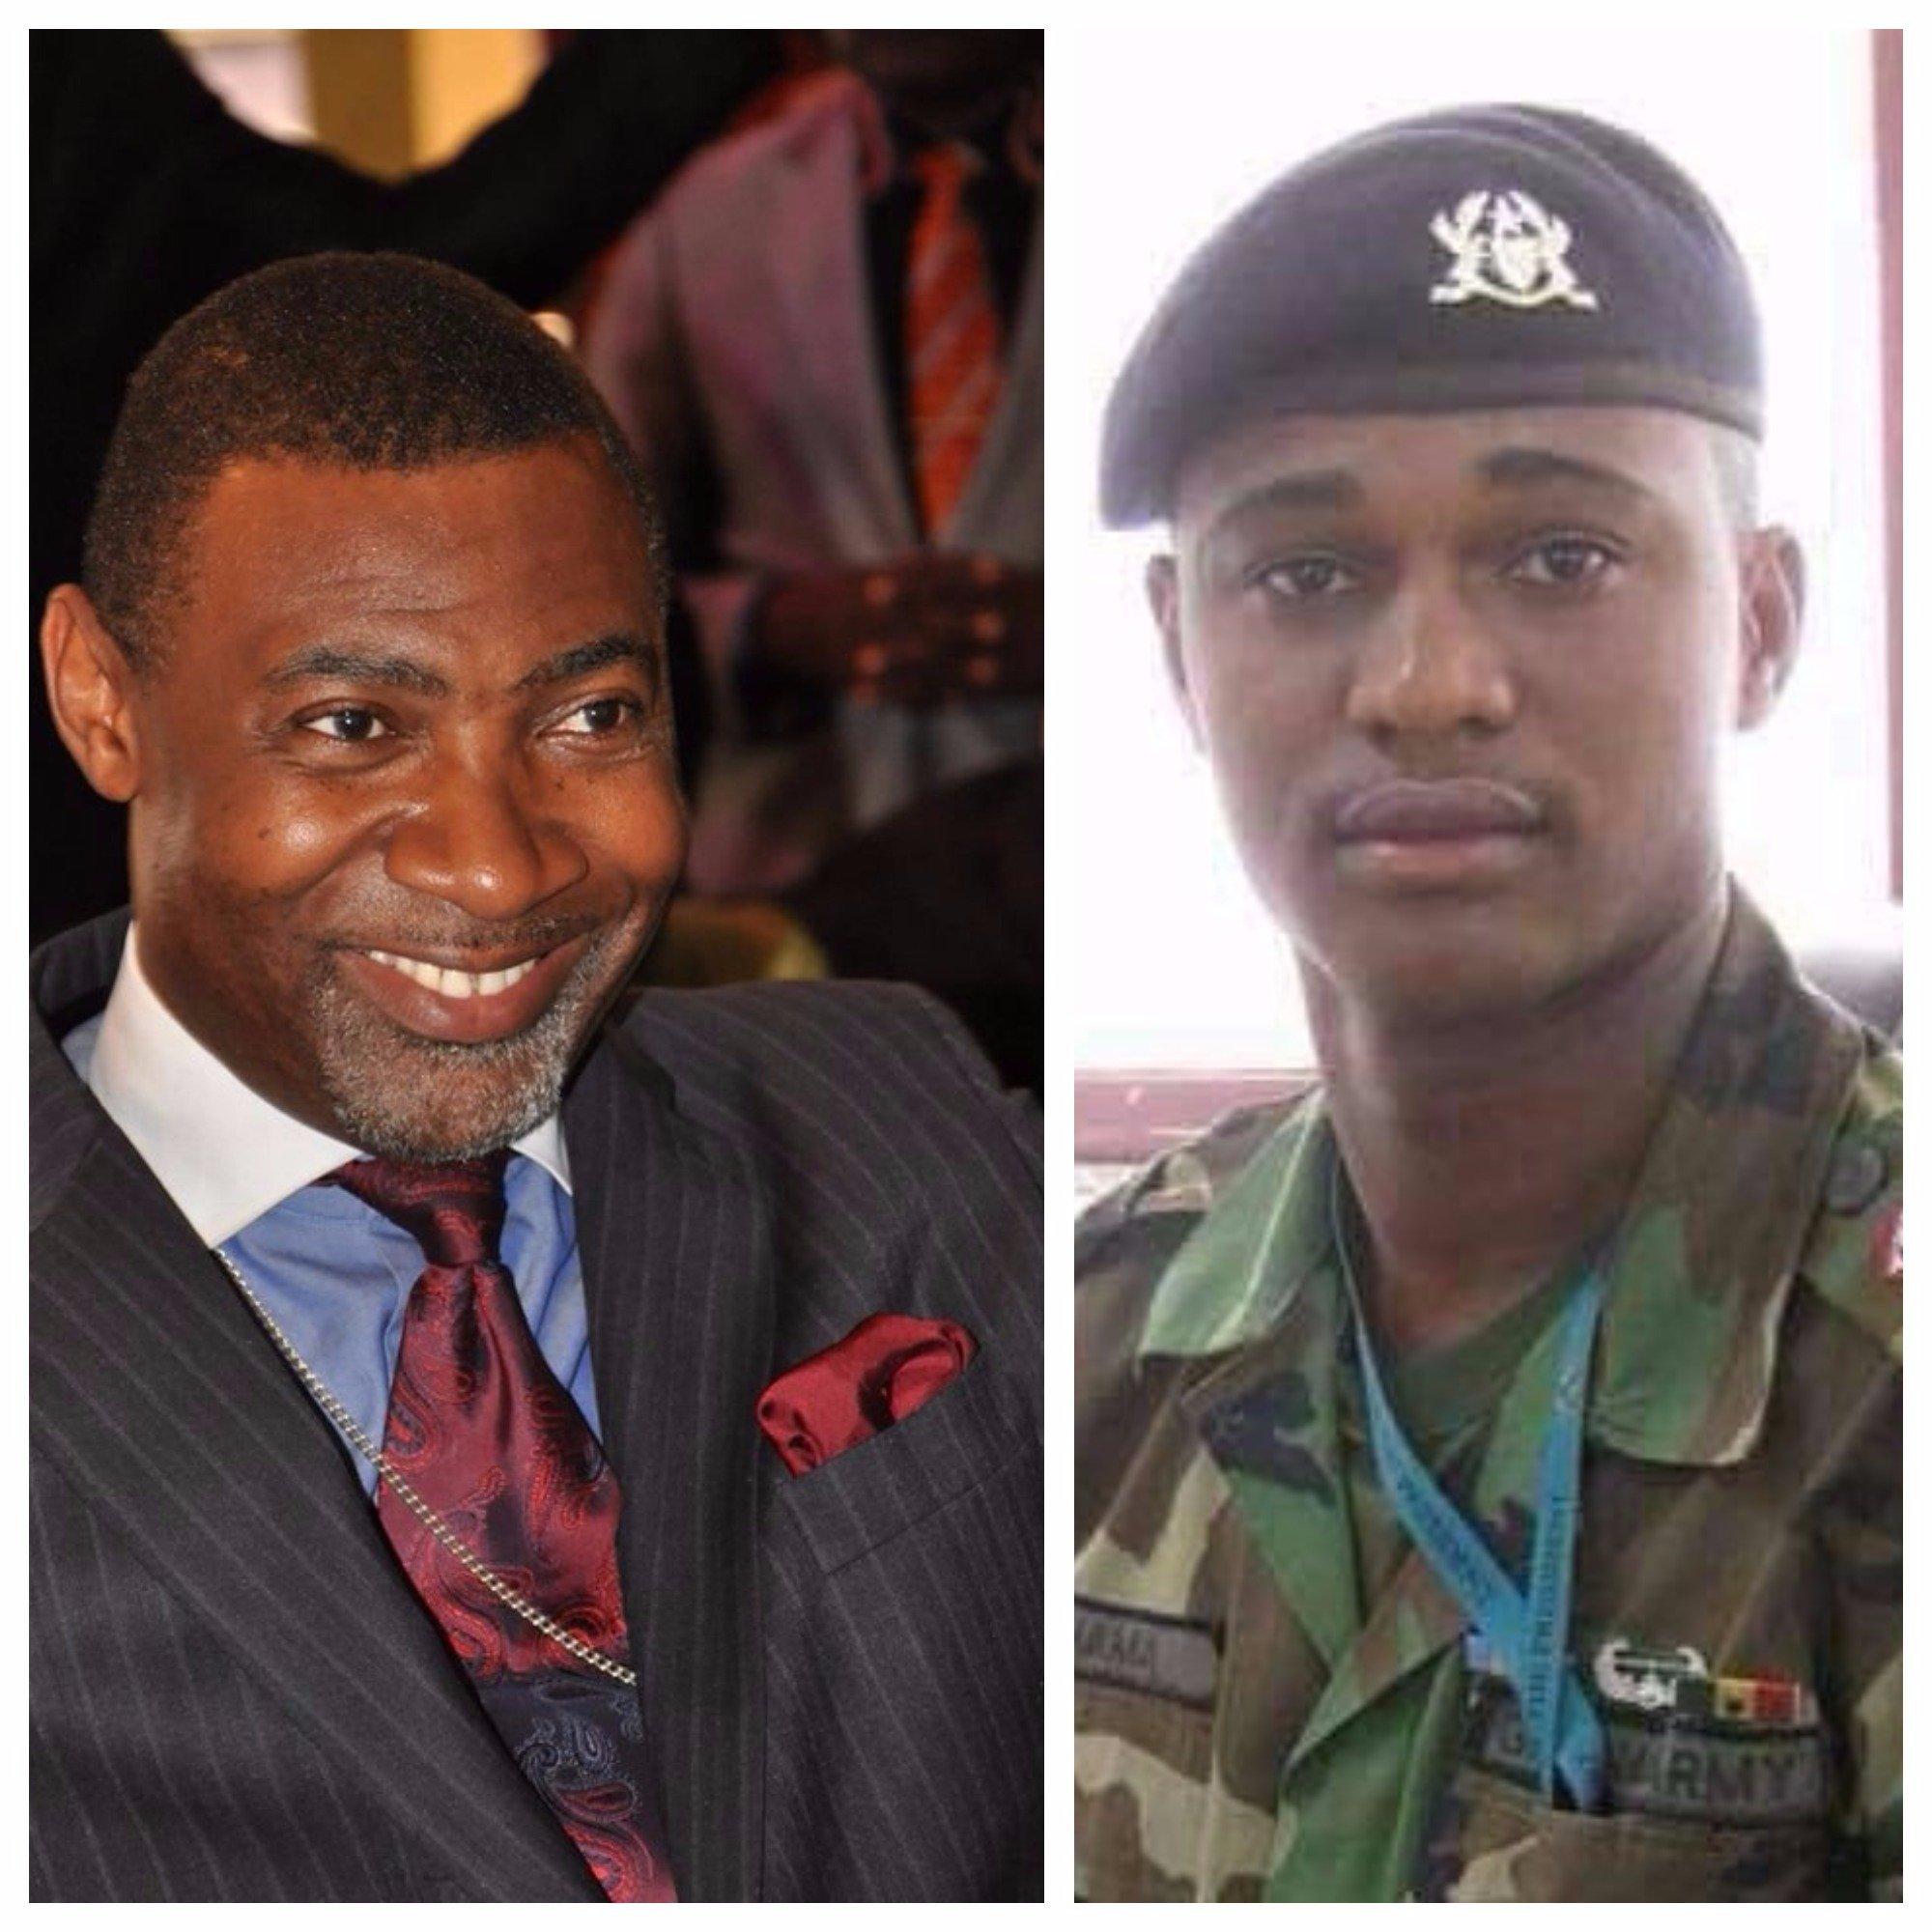 Forgive Major Mahama Killers - Dr Lawrence Tetteh